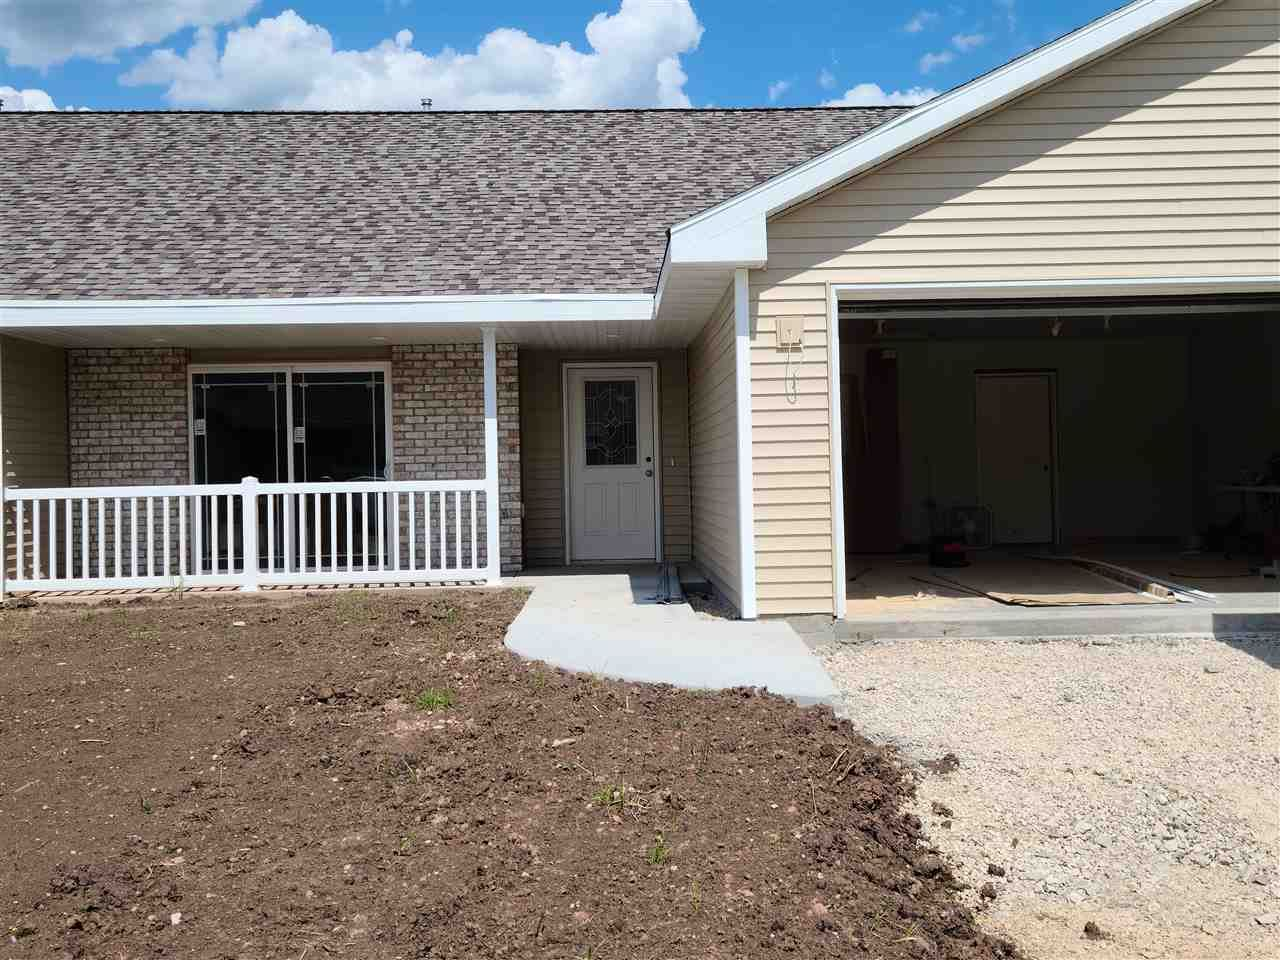 100 STONE CASTLE Drive, Fond du Lac, WI 54935 - MLS#: 50227035